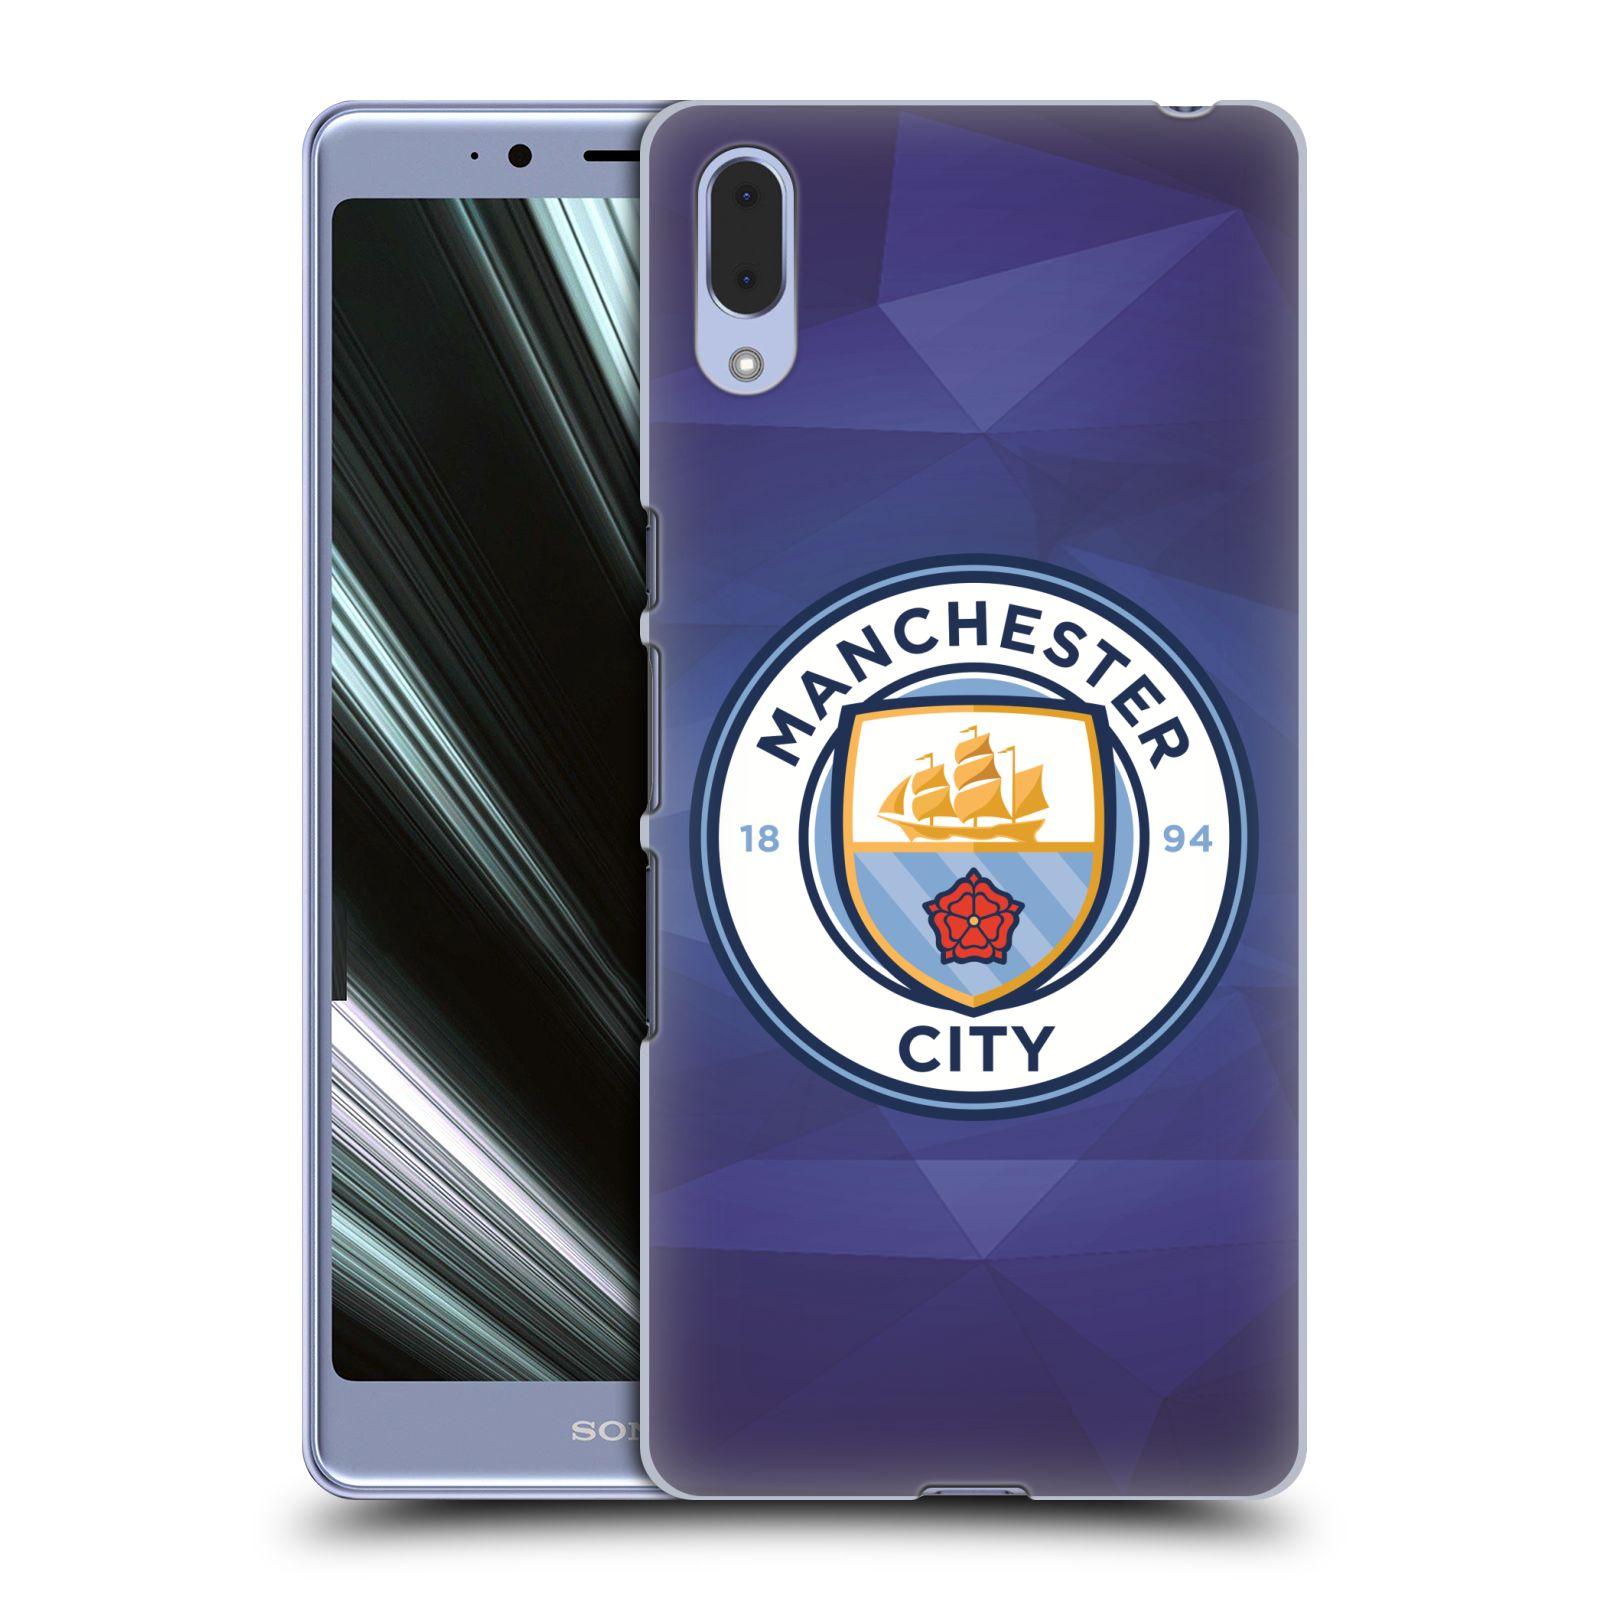 Plastové pouzdro na mobil Sony Xperia L3 - Head Case - Manchester City FC - Modré nové logo